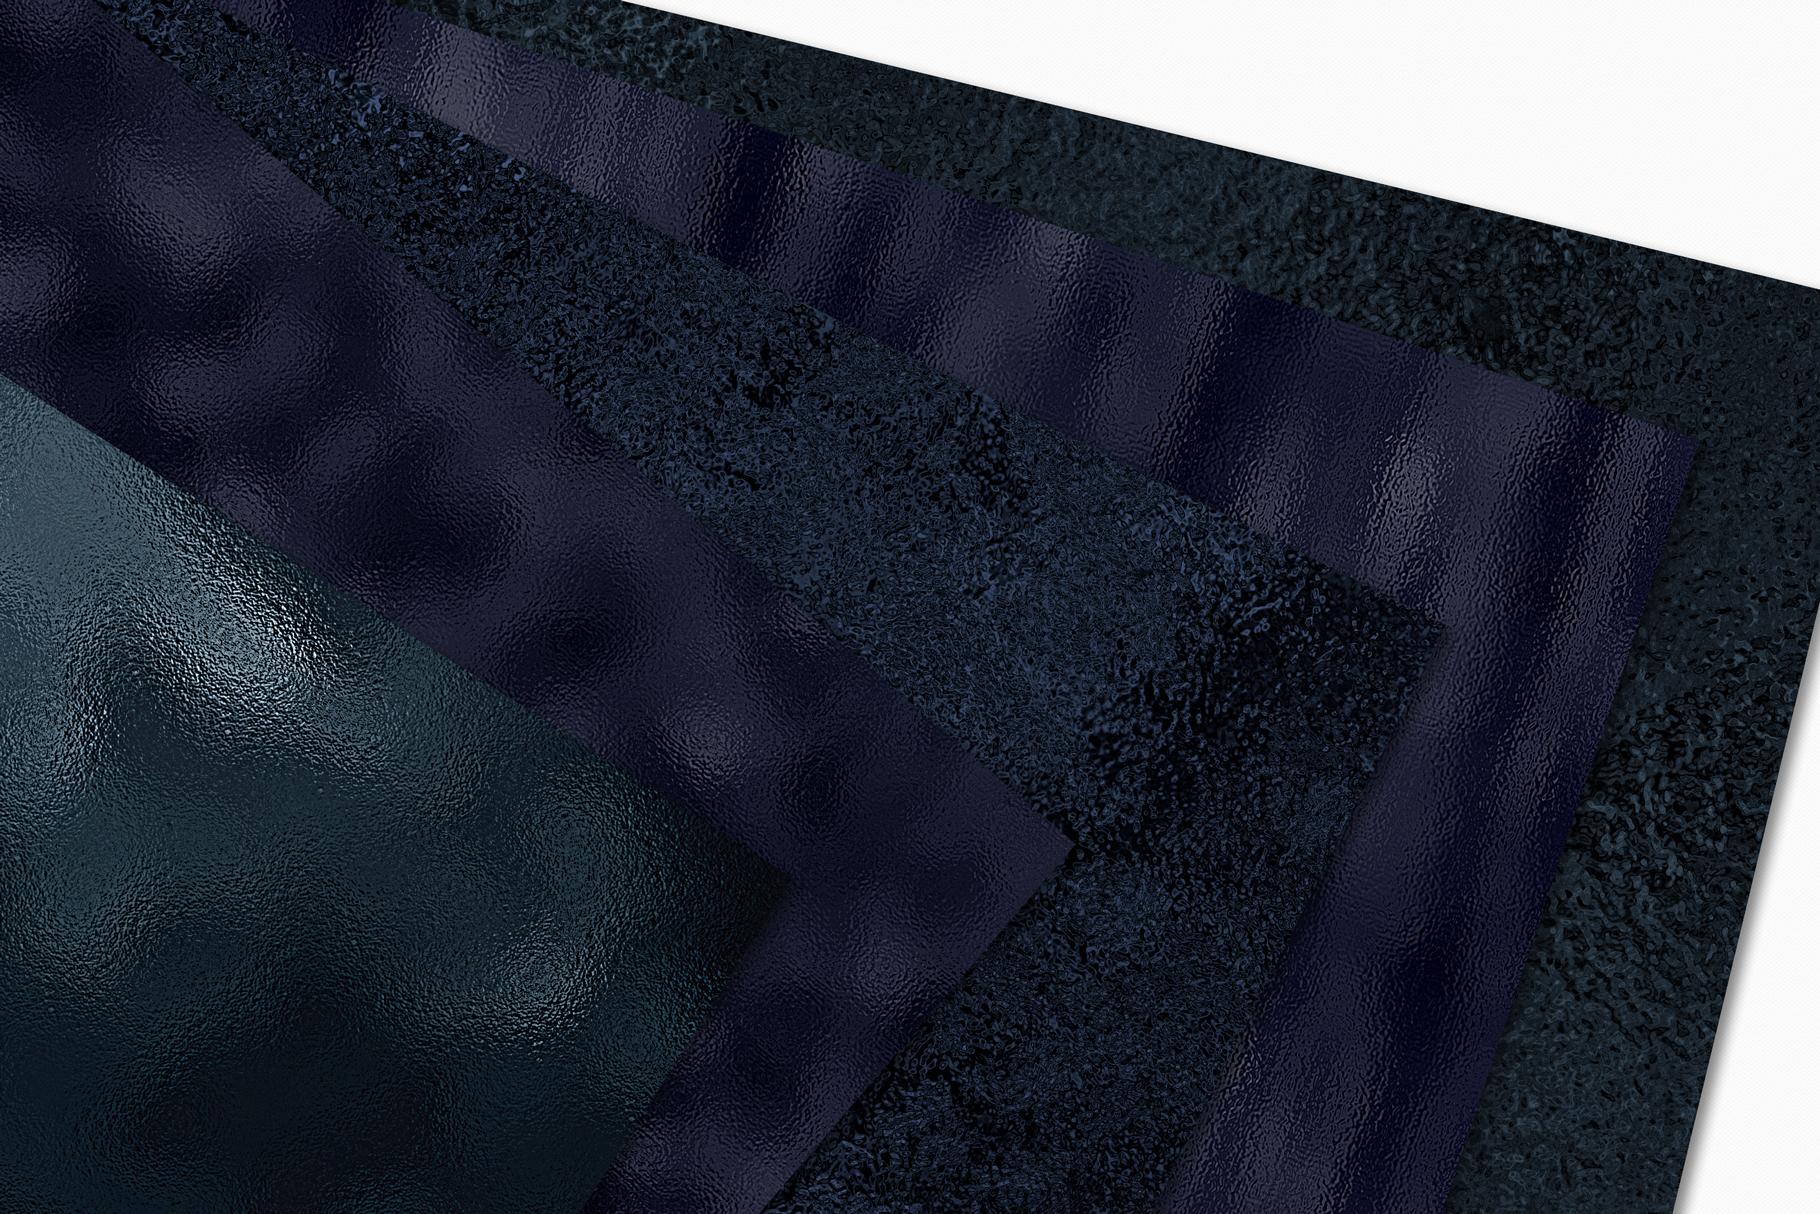 Dark Metallic Textures - 15 Foil & Glitter Digital Papers example image 4